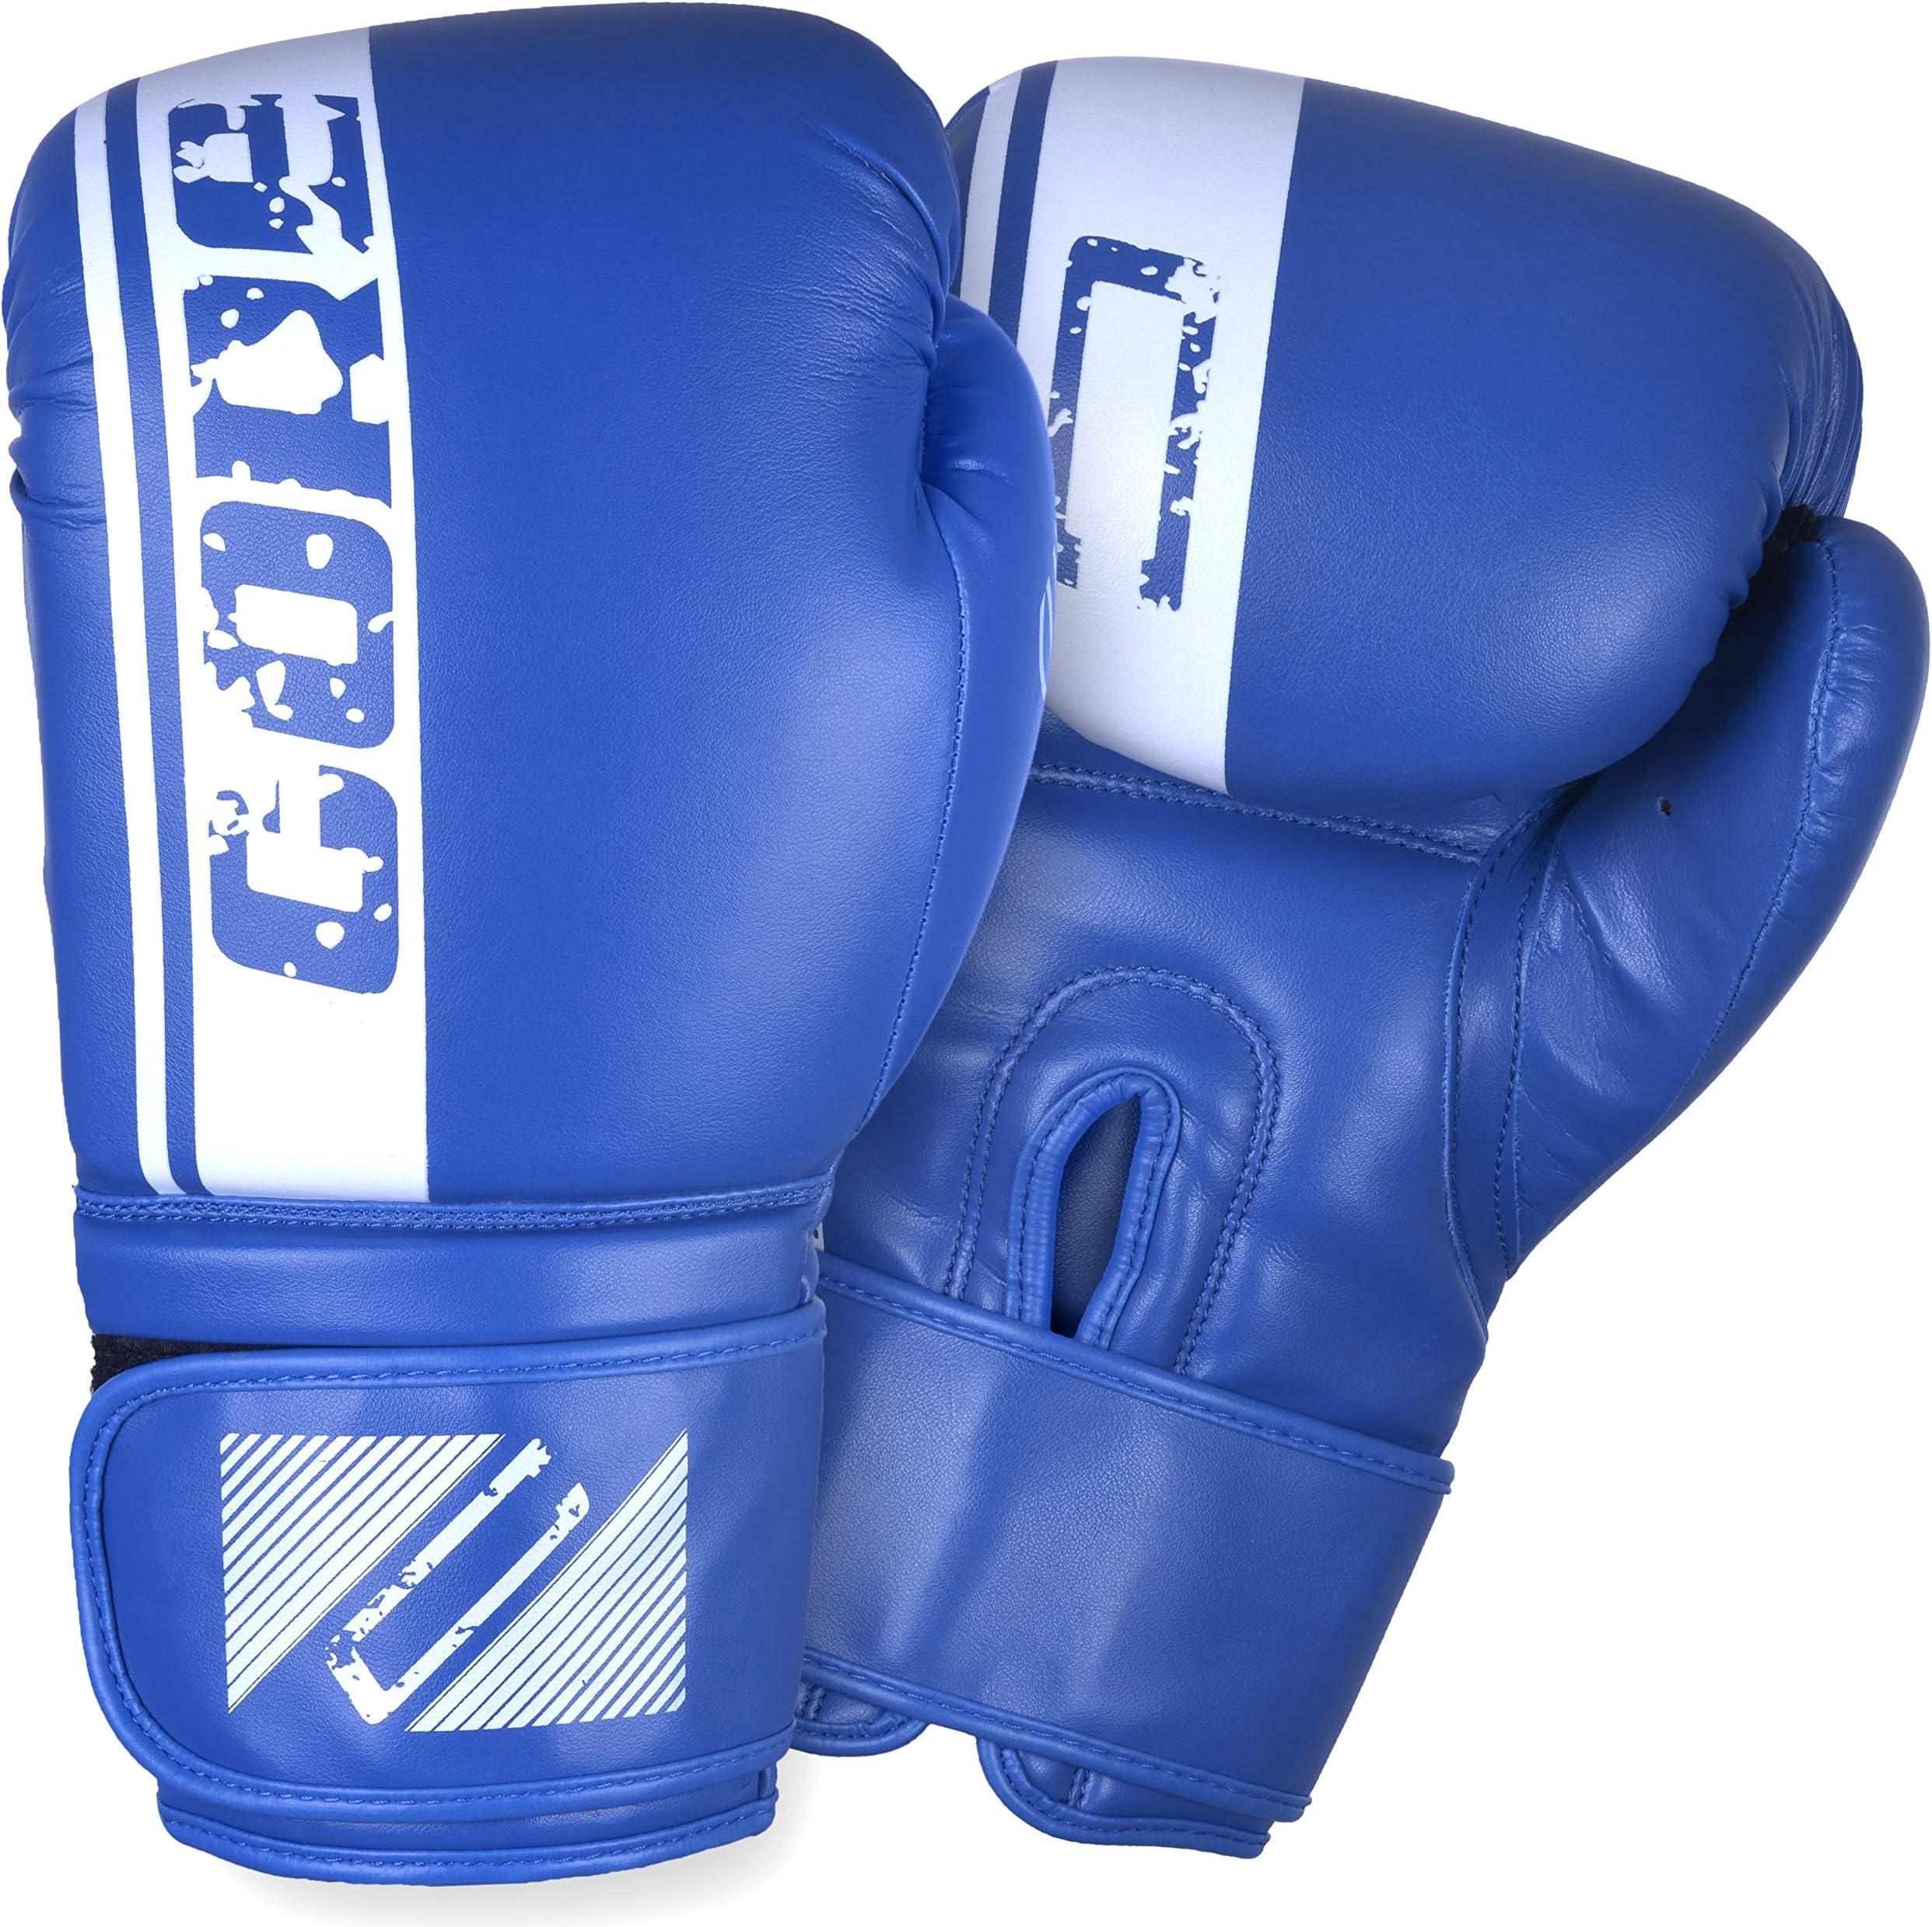 Boxing Gloves Pro Men Women Training Sparring Kickboxing Muay Thai UFC Bag Mitts